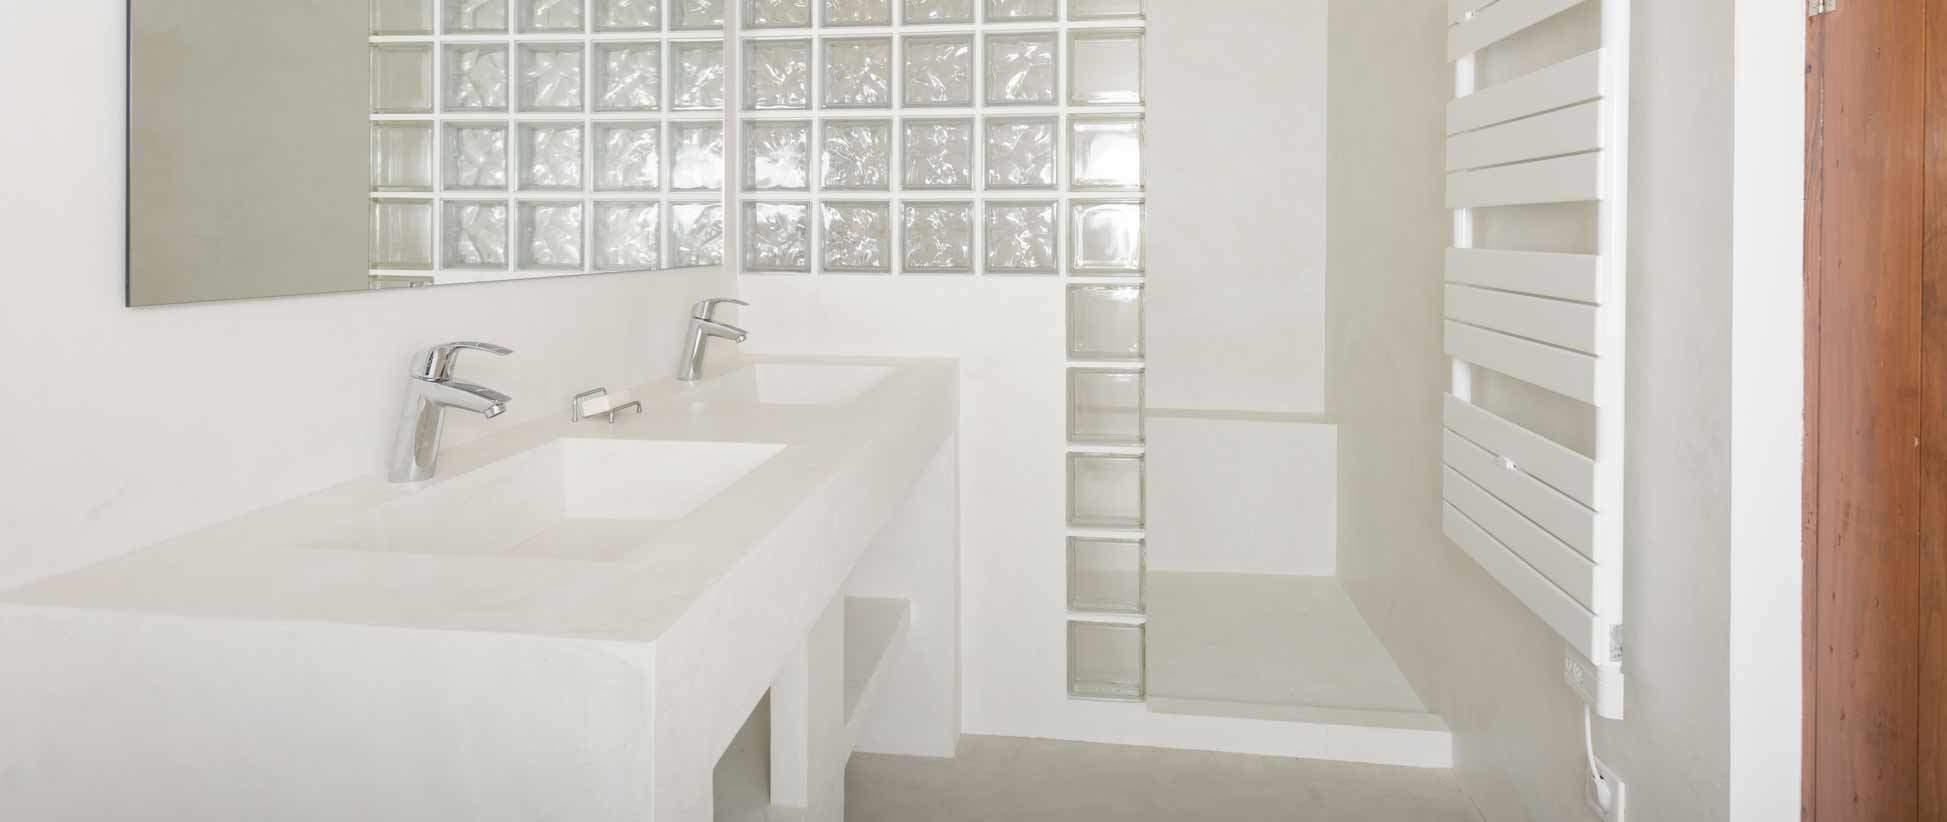 Brique de verre castorama maison design - Castorama laine de verre ...